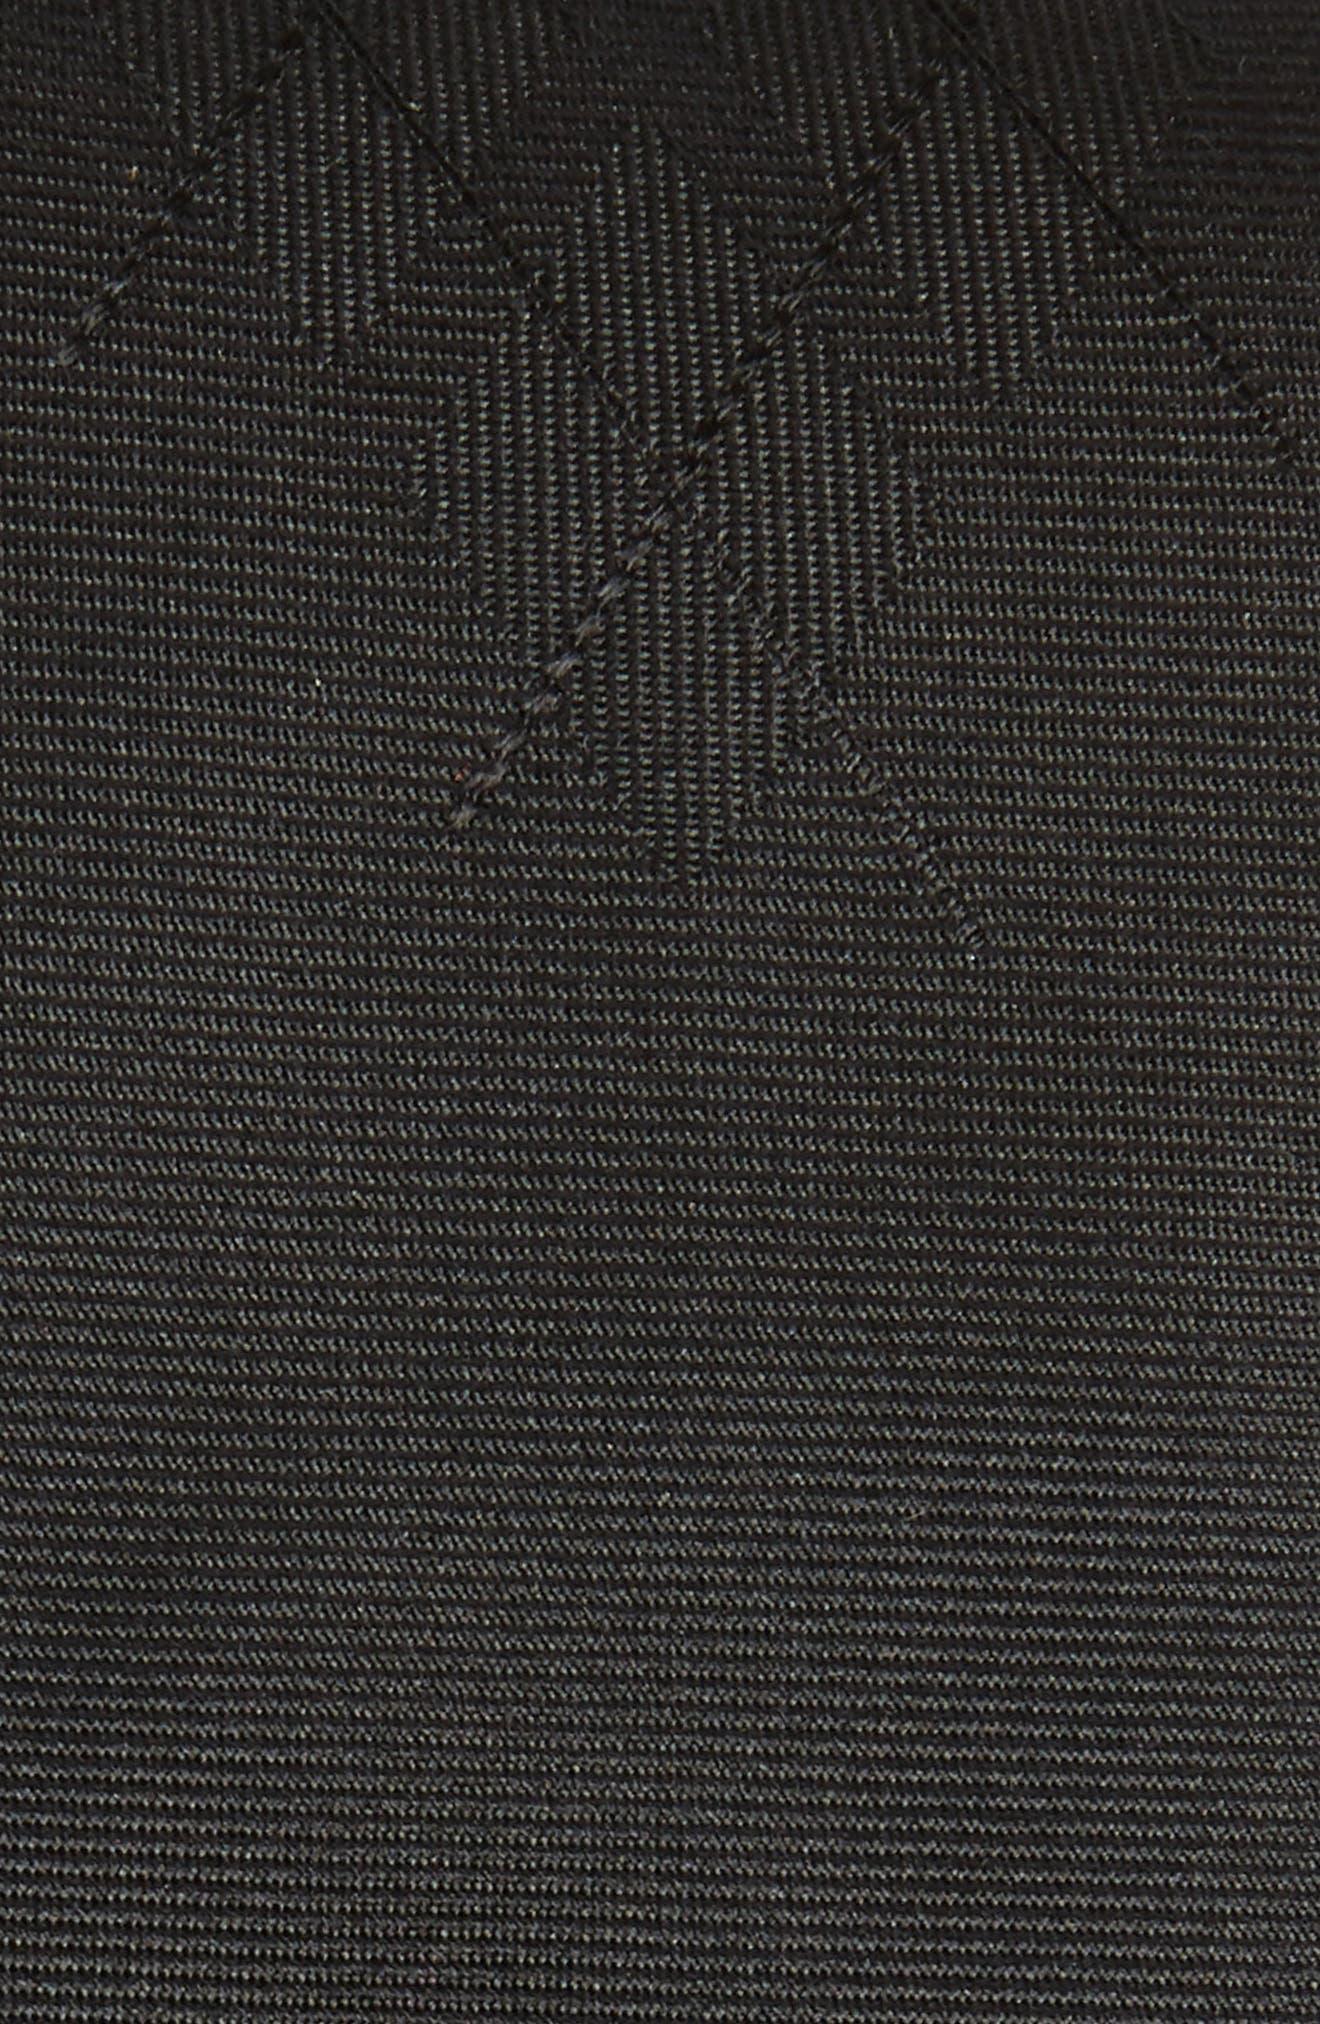 Argyle Silk Skinny Tie,                             Alternate thumbnail 2, color,                             001